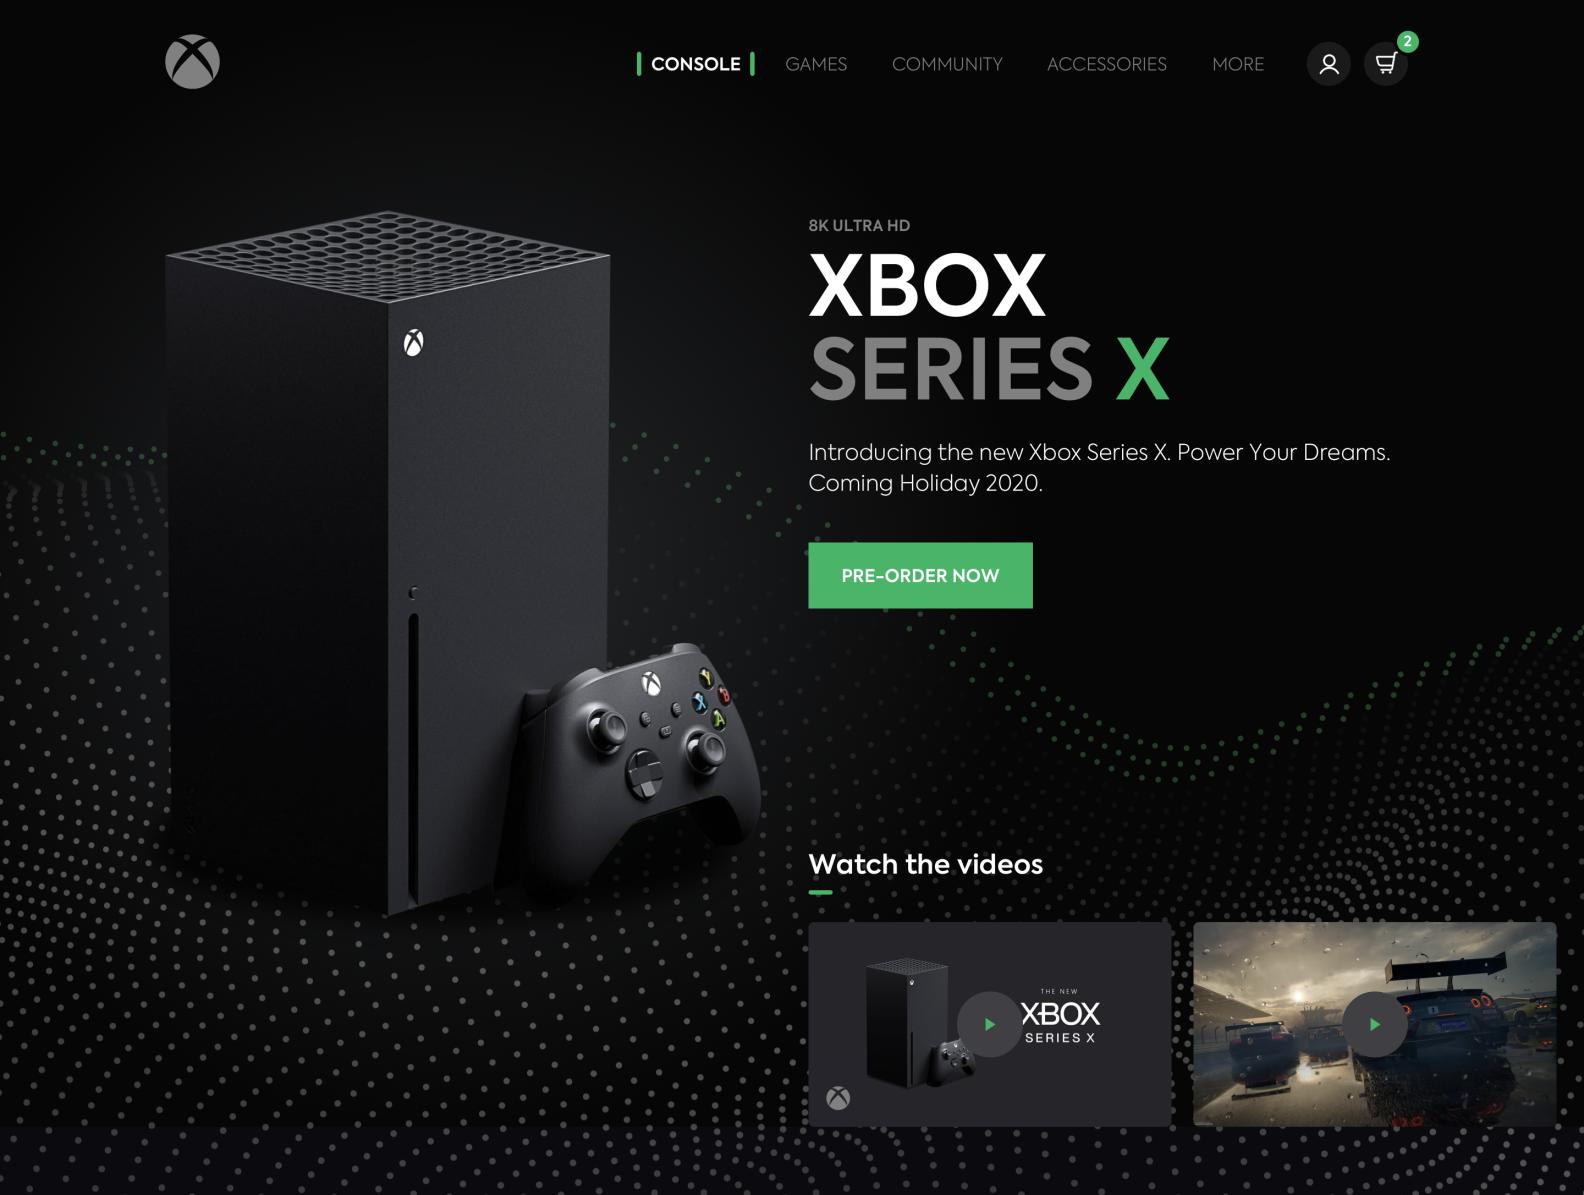 Xbox Series X In 2020 Xbox Black Xbox Black Friday Stores